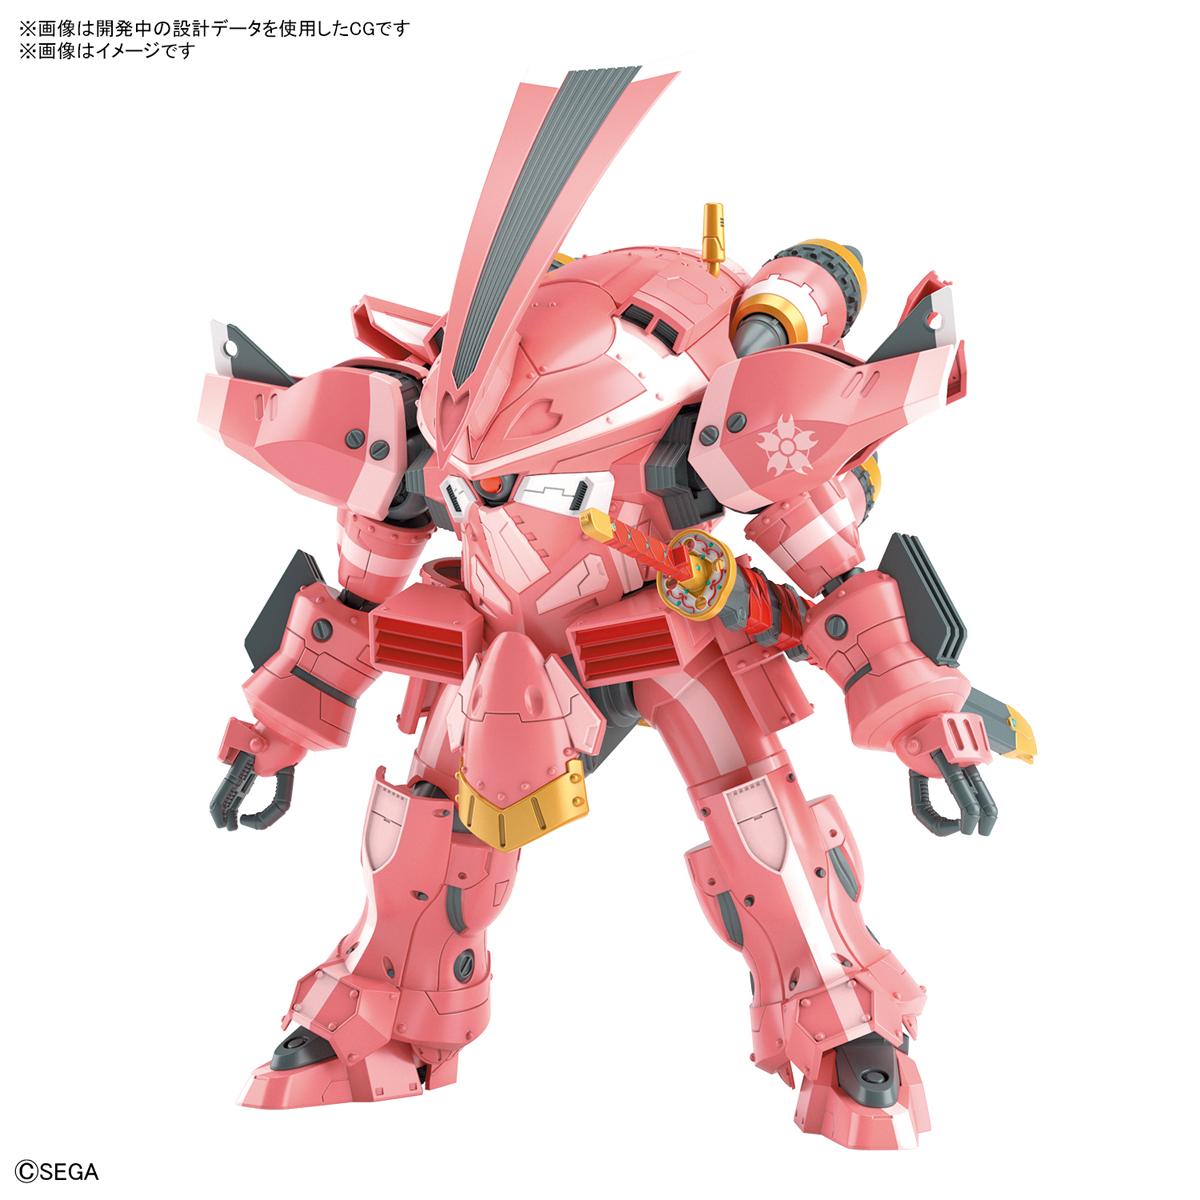 PREORDER BANDAI HG 1/24 Reiko Fighter, Trial Sakuratake (Tengu Sakura Machine)